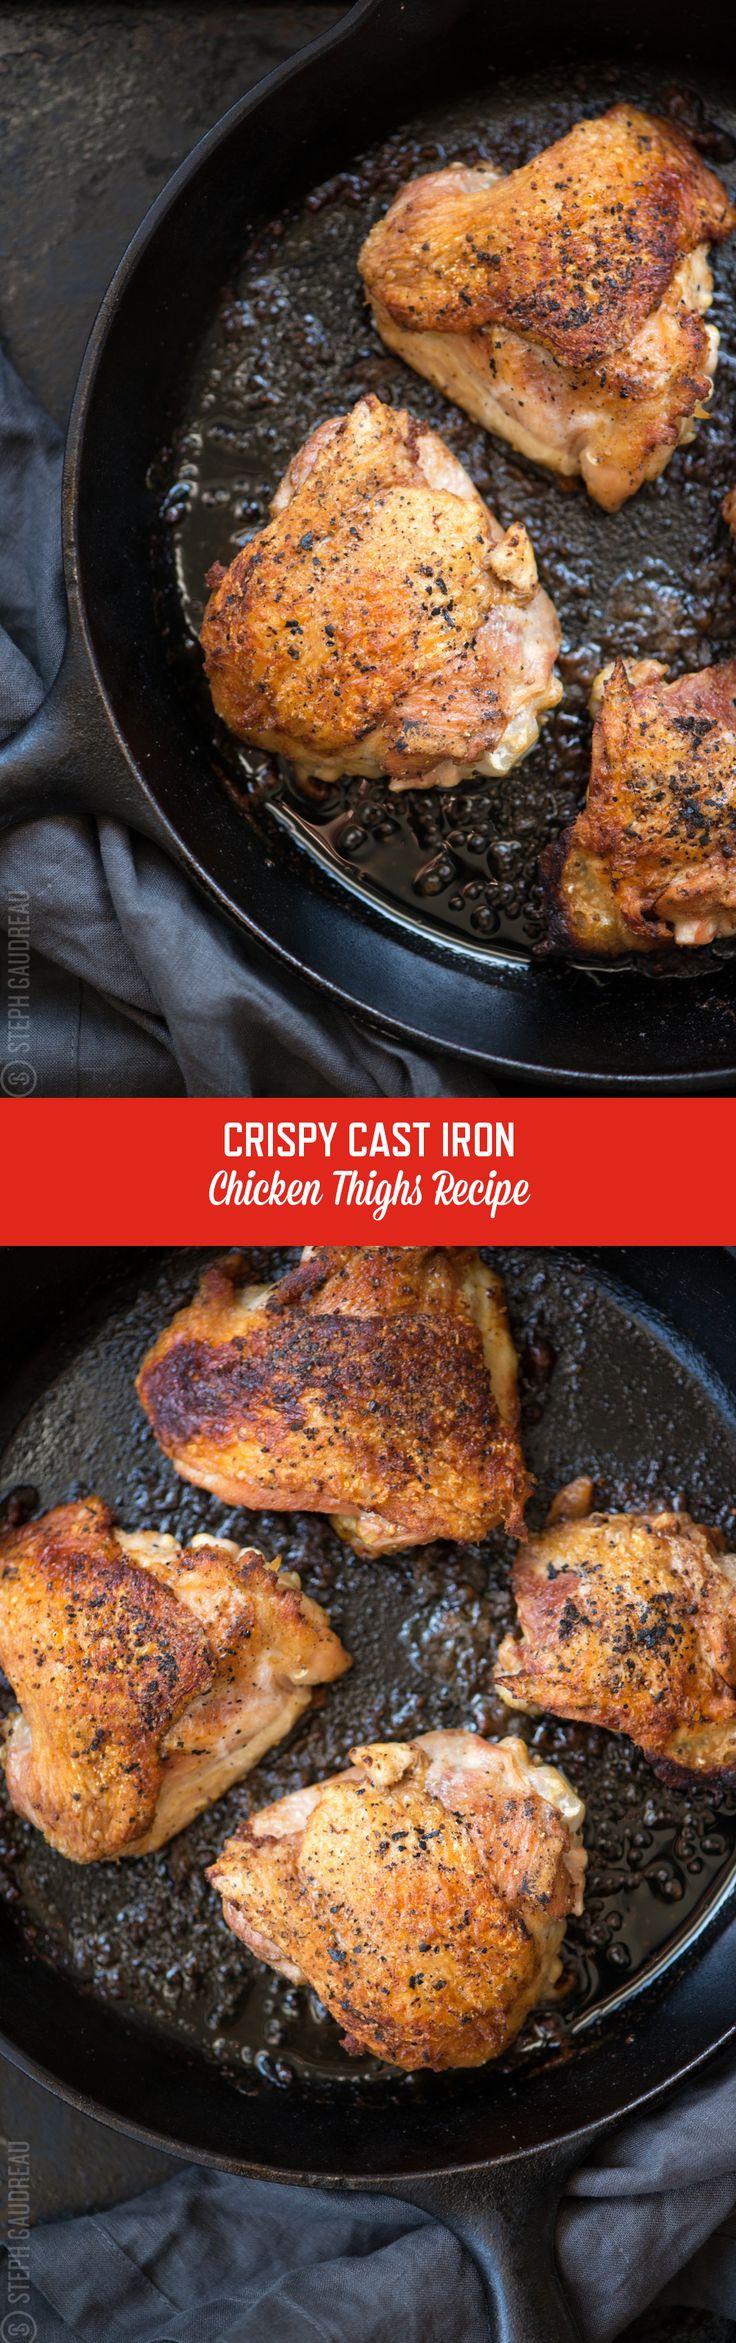 Cast Iron Skillet Chicken Thighs Recipe | StupidEasyPaleo.com